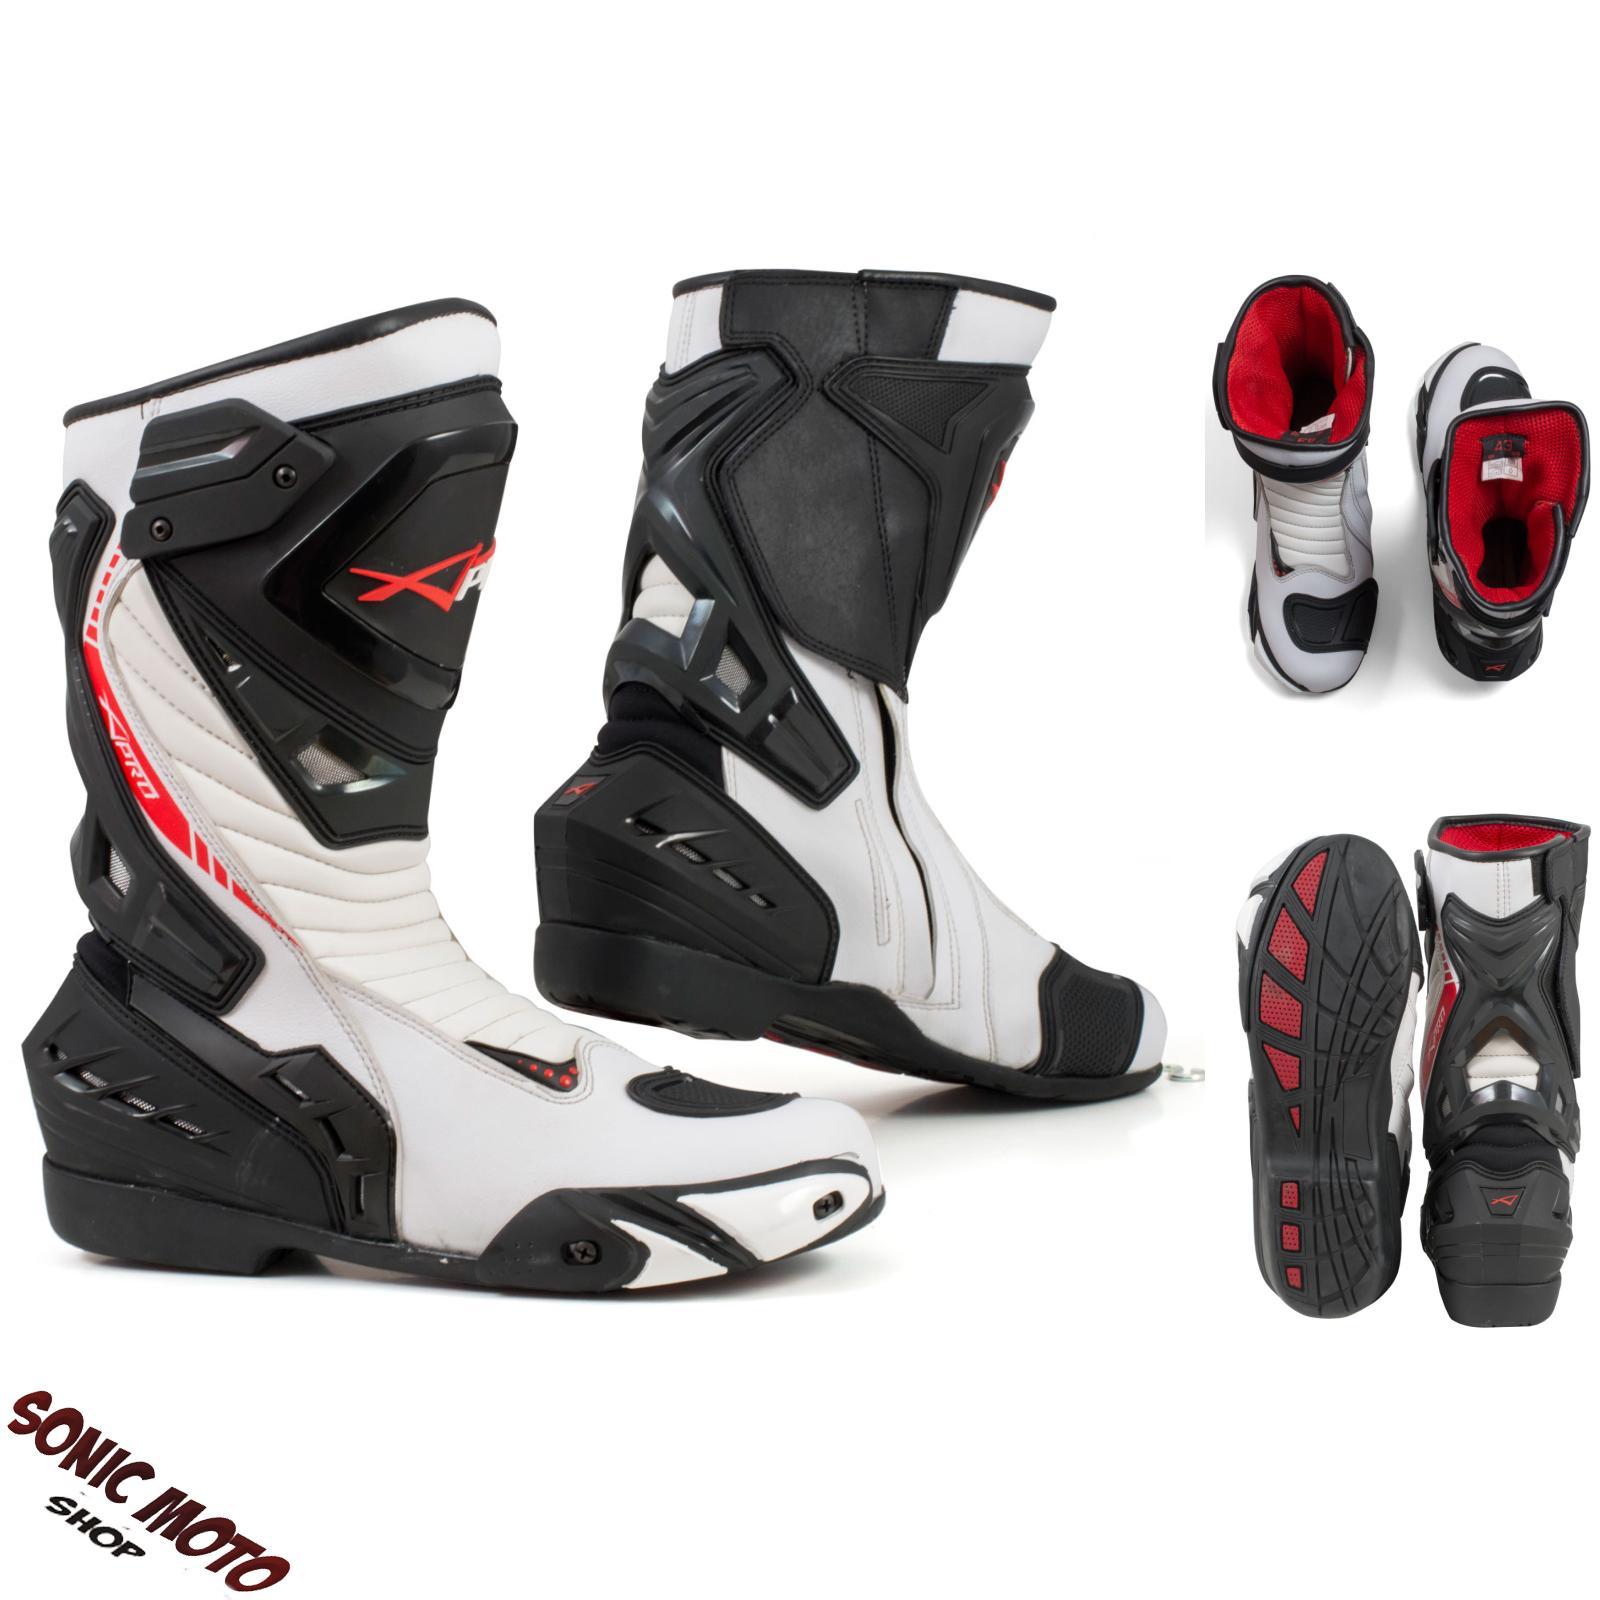 Stivali-Moto-Sport-Racing-Pista-Strada-Tecnico-Microfibra